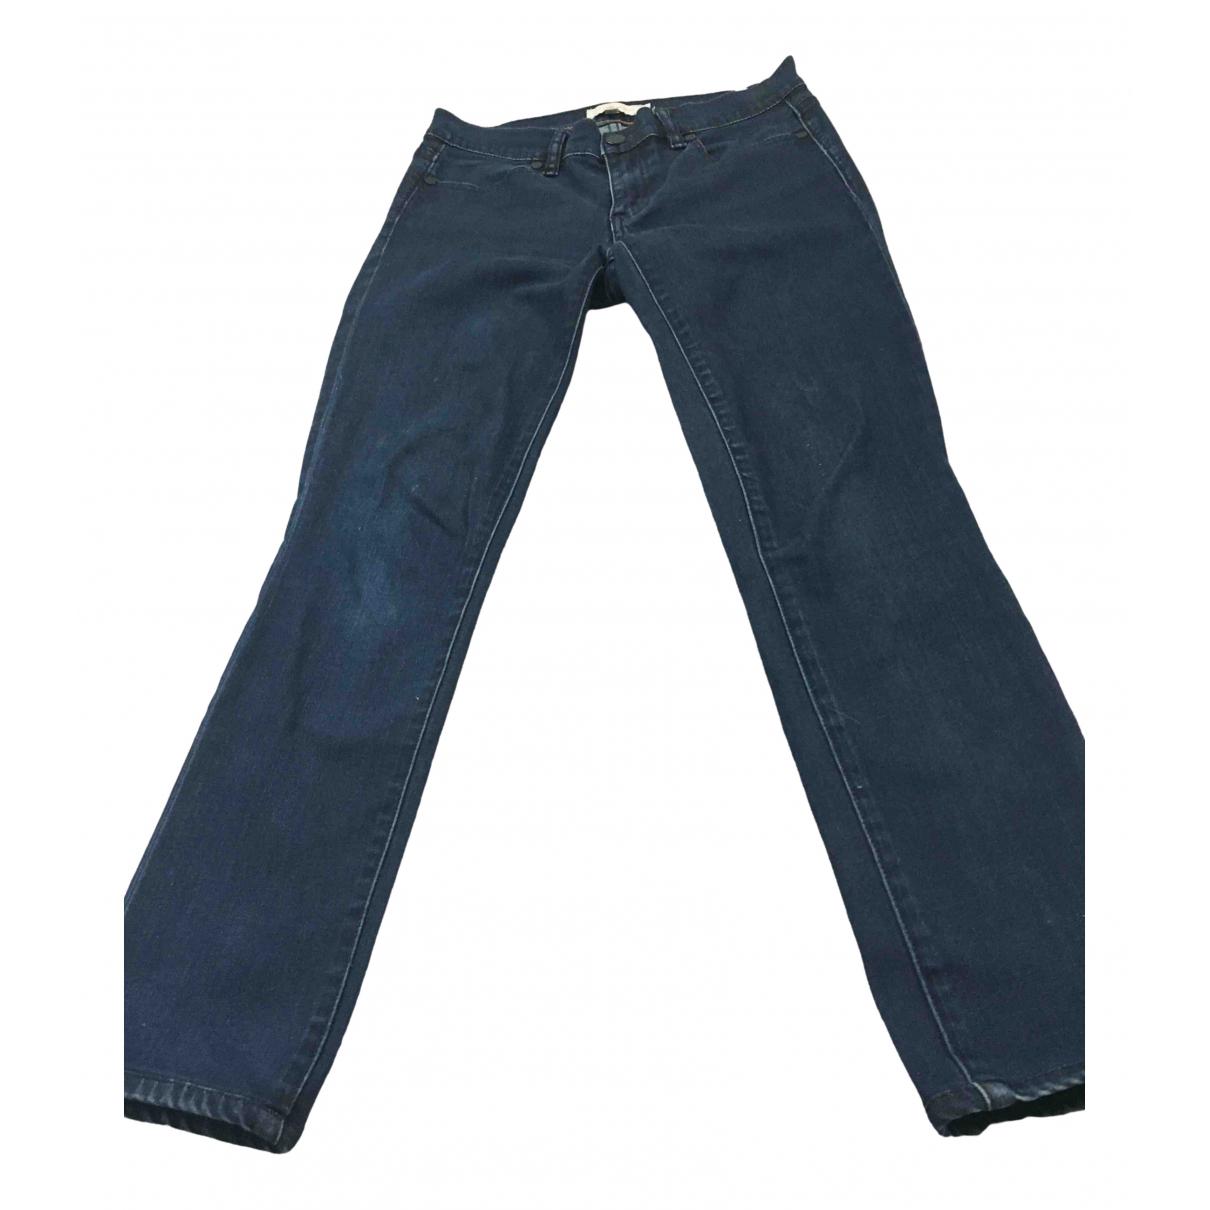 Tory Burch \N Navy Denim - Jeans Jeans for Women 26 US